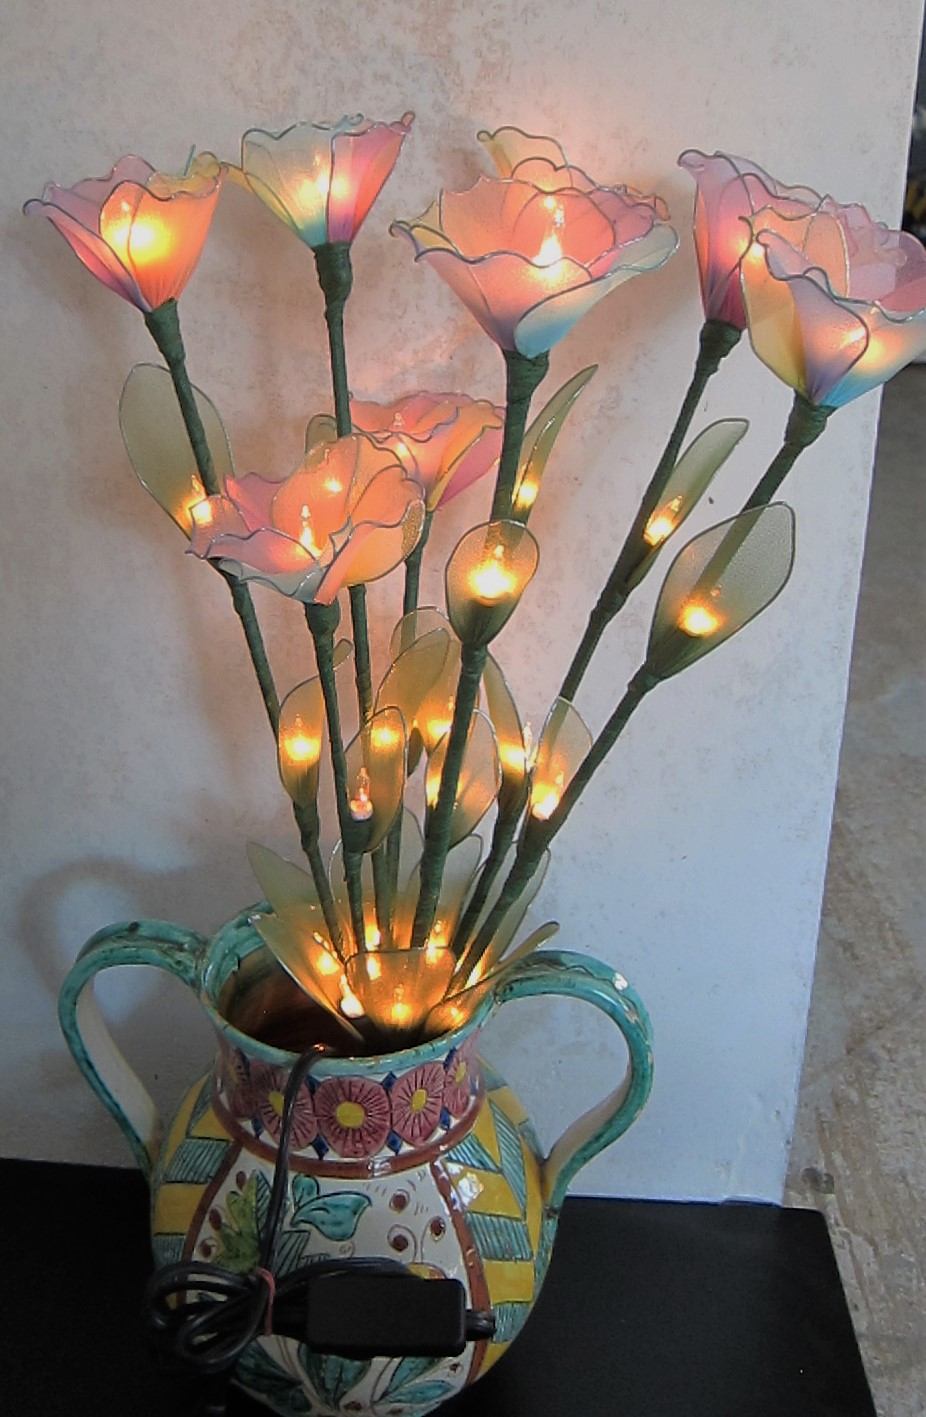 Flower Lights_4048